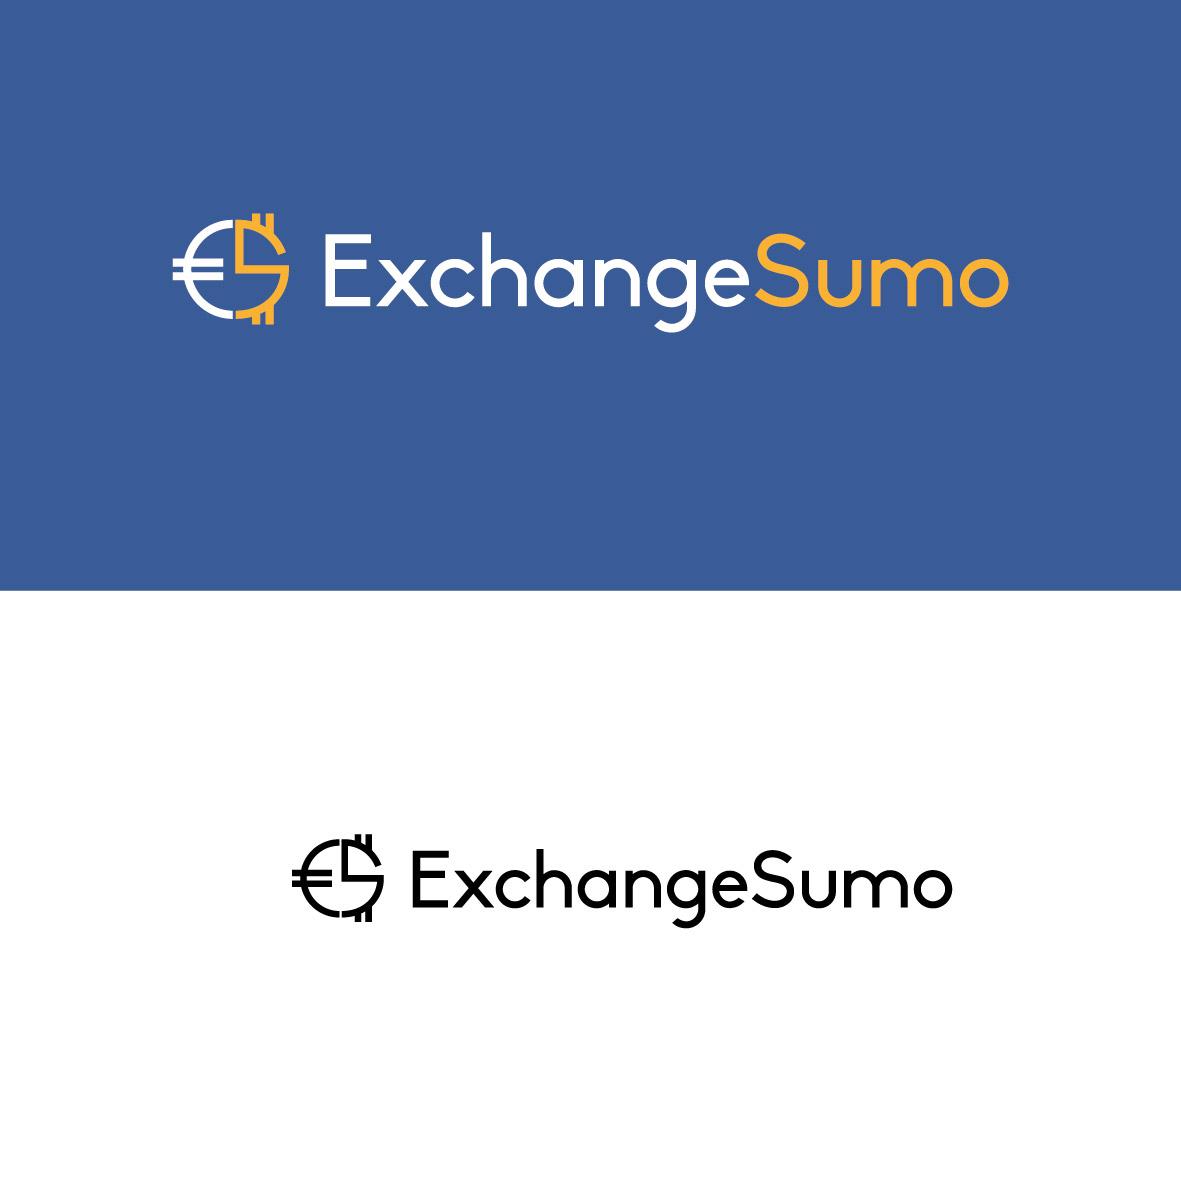 Логотип для мониторинга обменников фото f_2825bae625c829f4.jpg